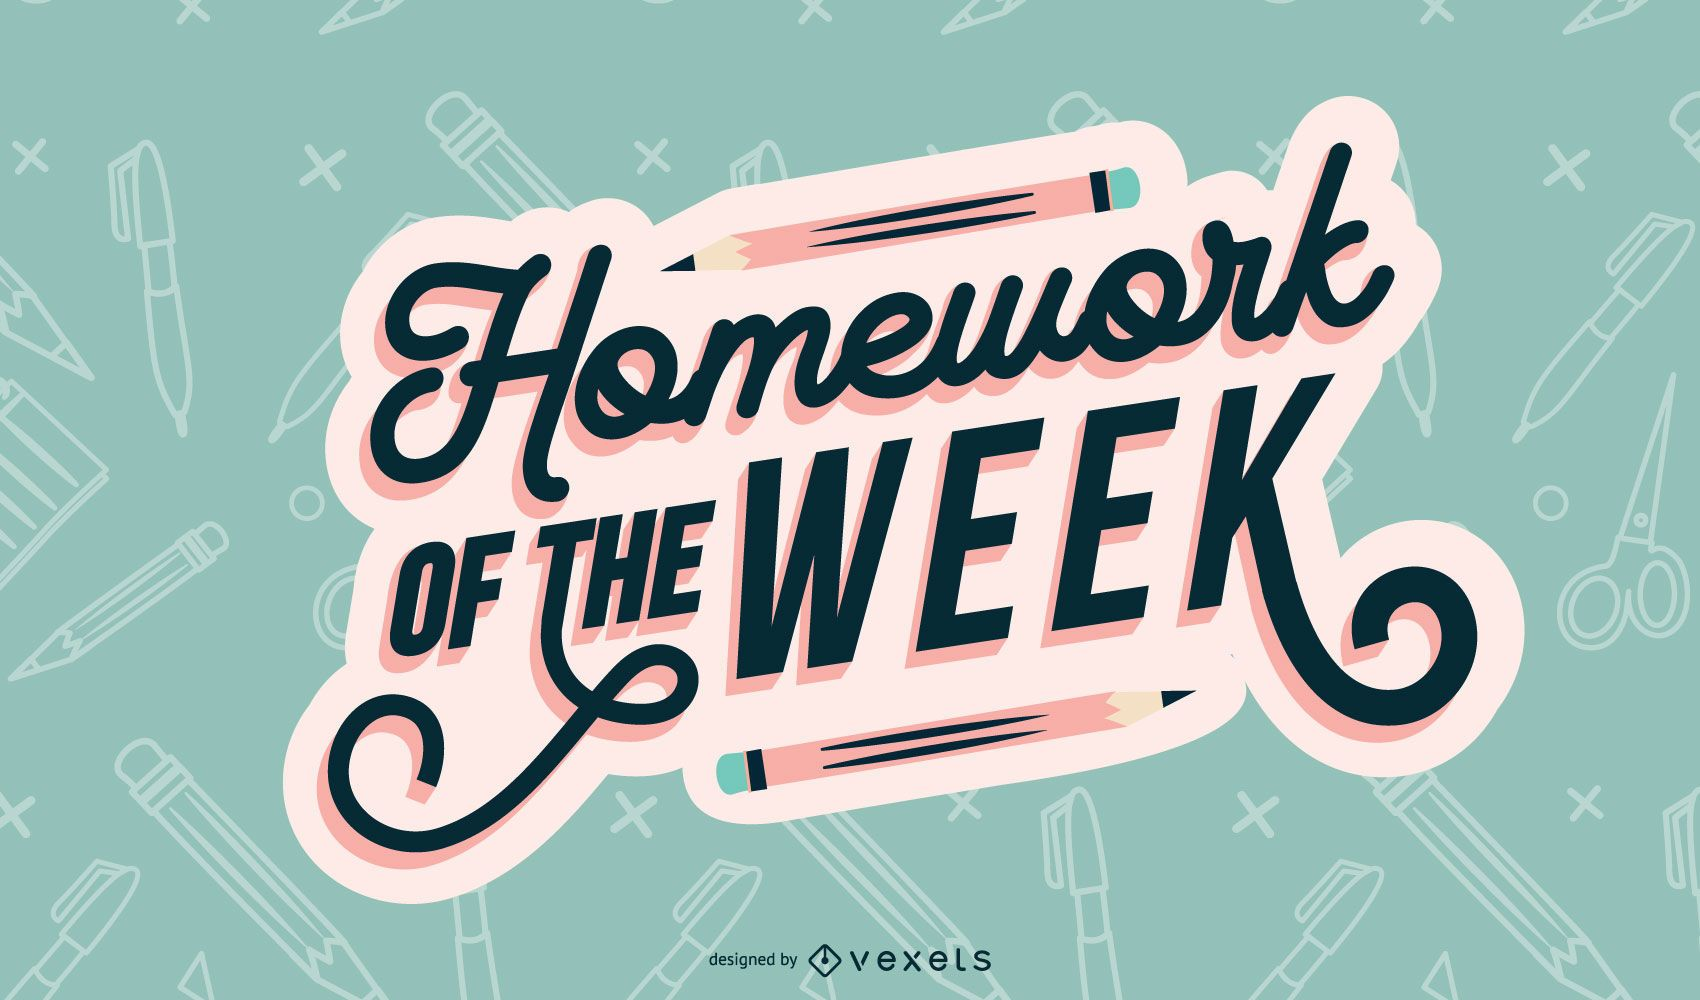 Week homework lettering design